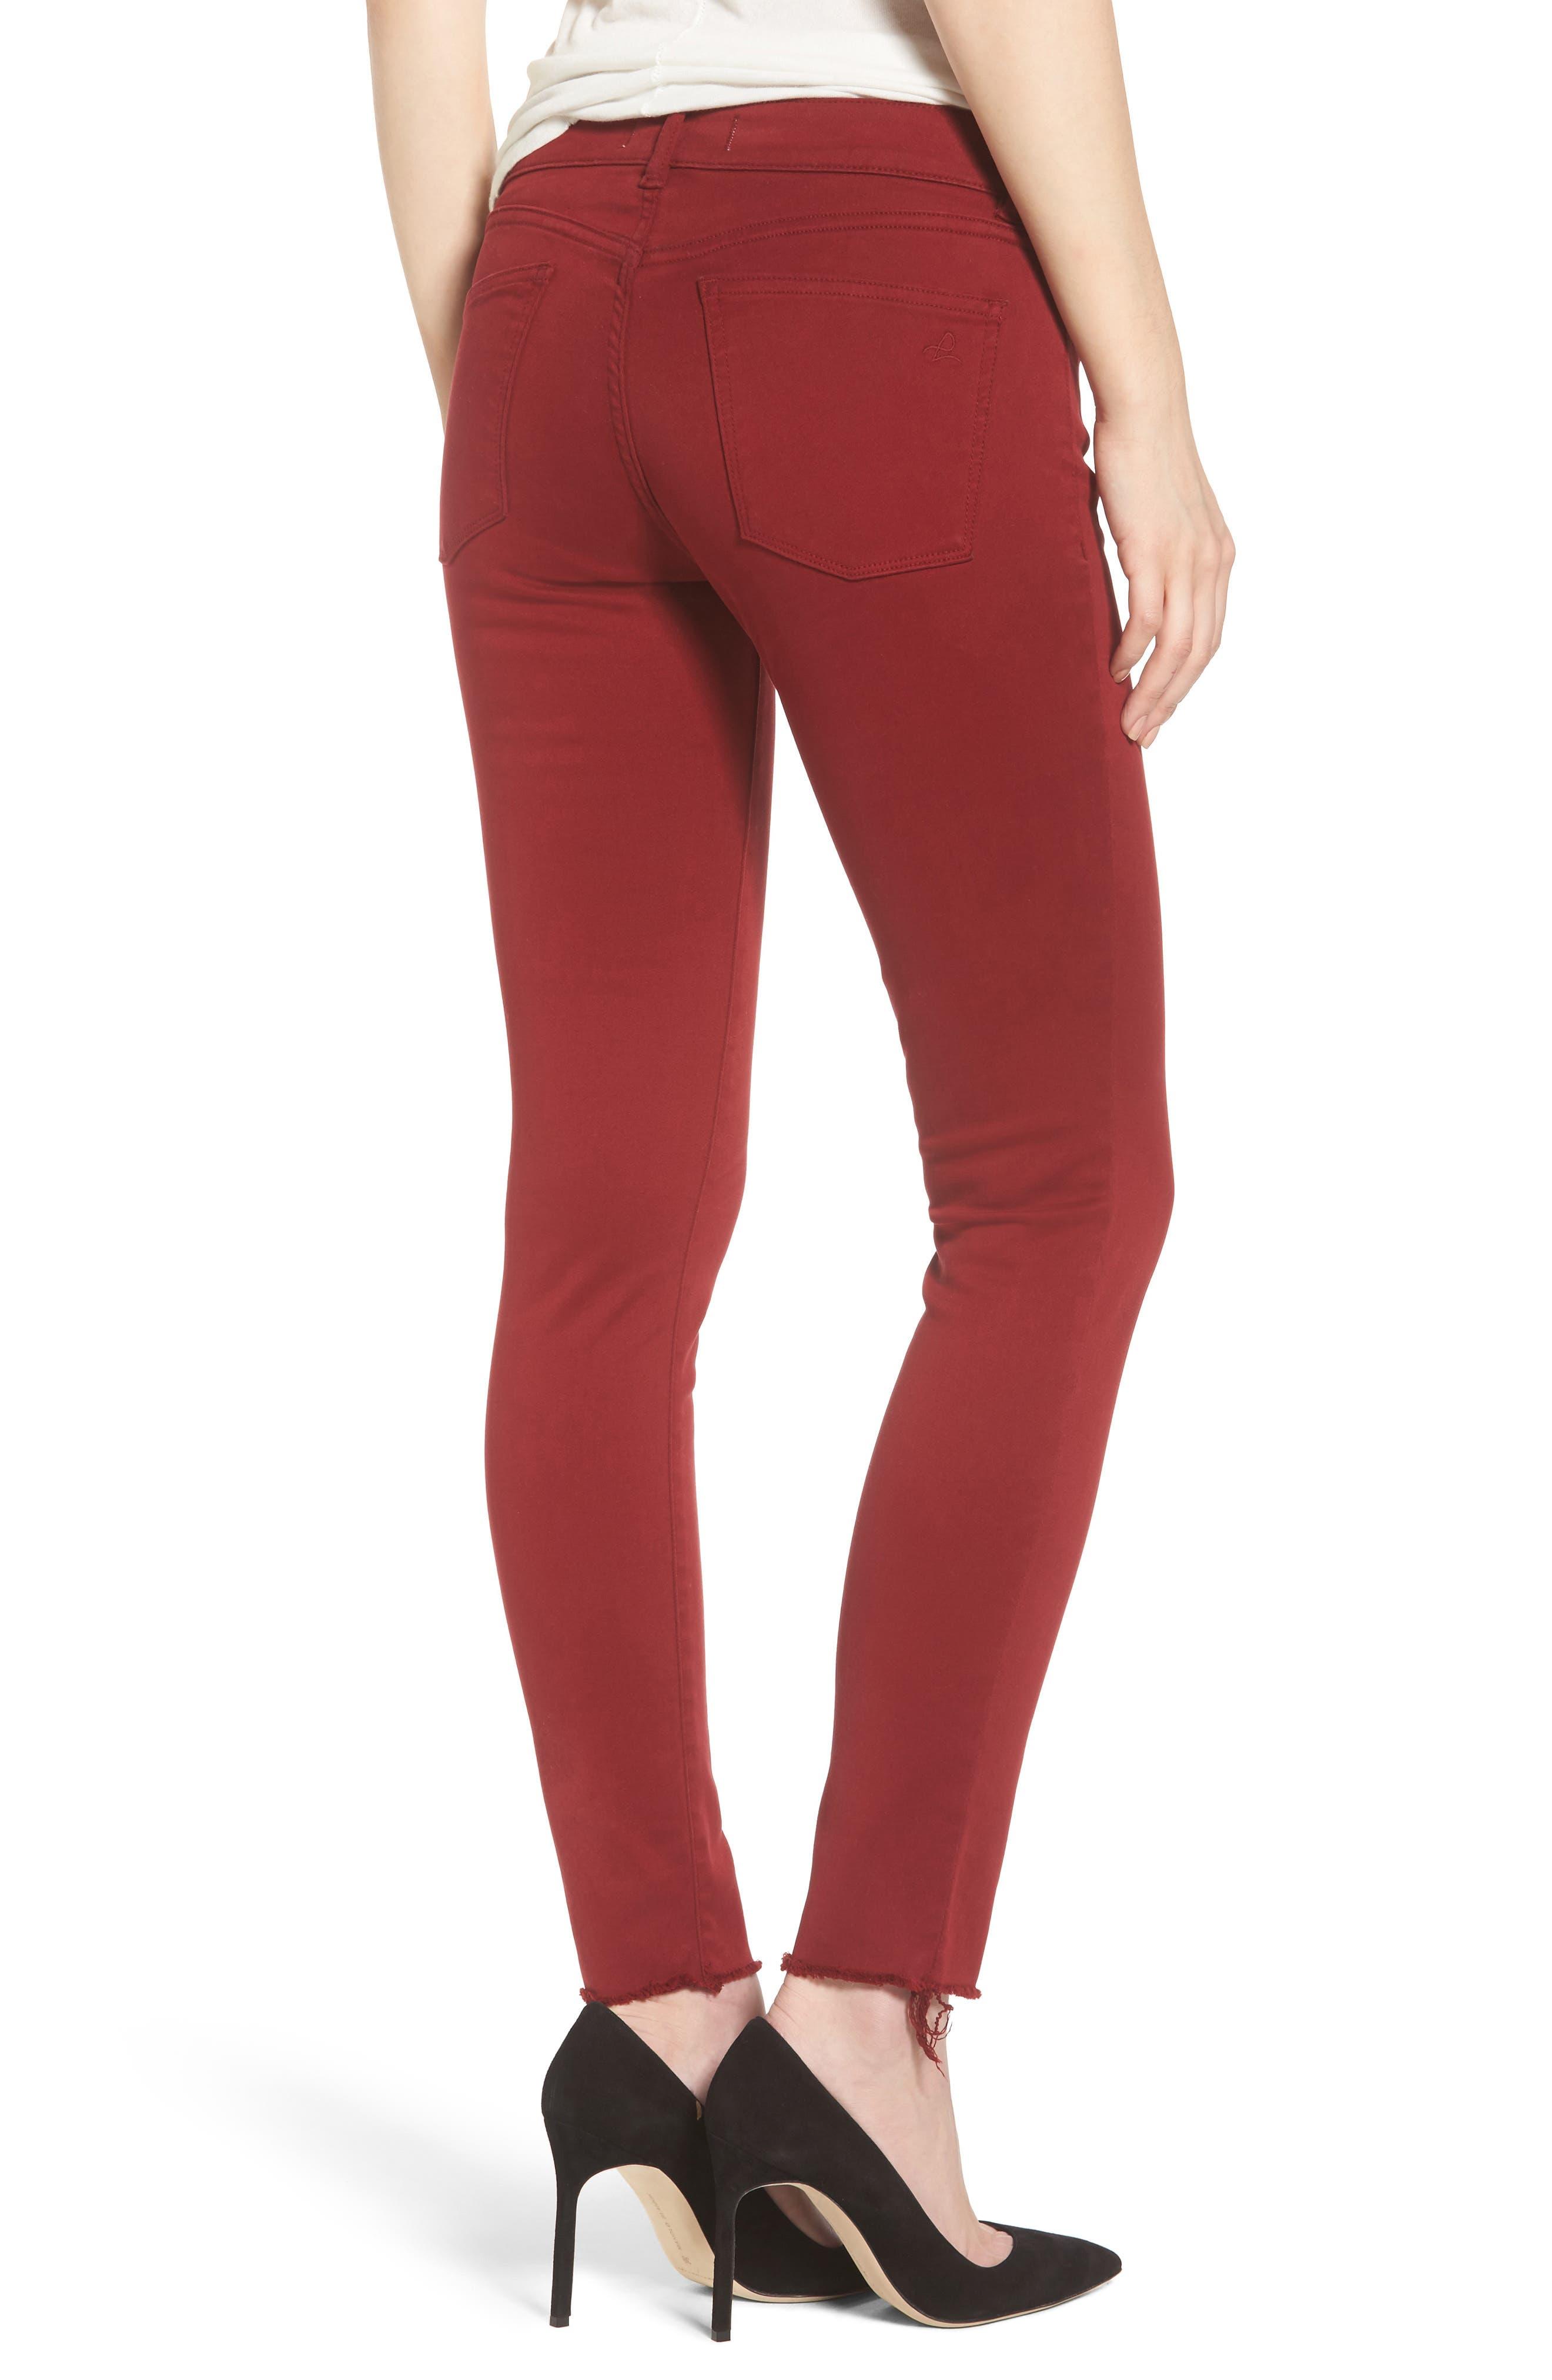 Alternate Image 2  - DL1961 Emma Power Legging Jeans (Rhubarb)